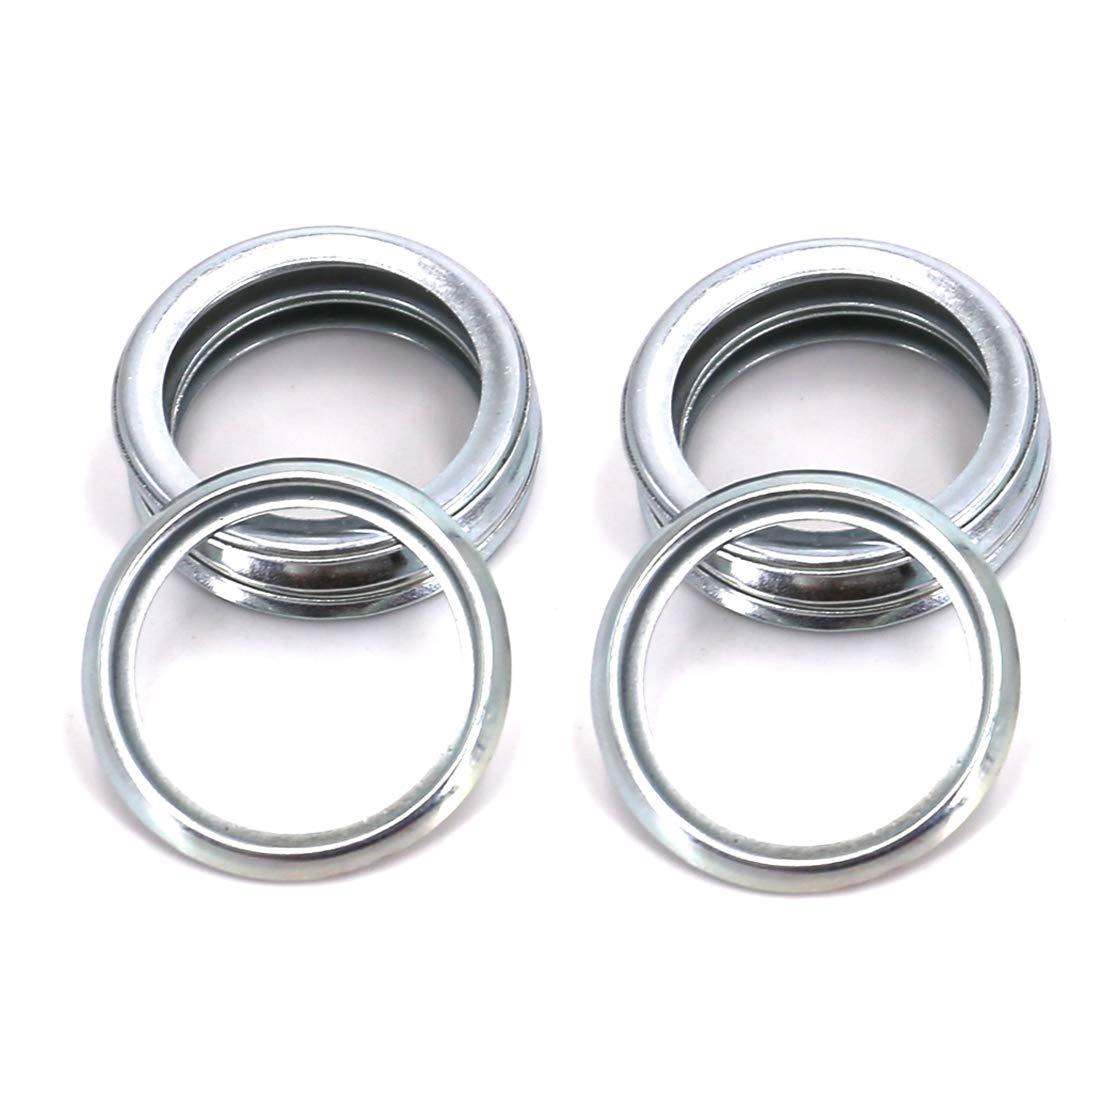 UTSAUTO Oil Drain Plug Gaskets Crush Washers Seals Rings Part # 11126AA000 for Subaru 20 Pack